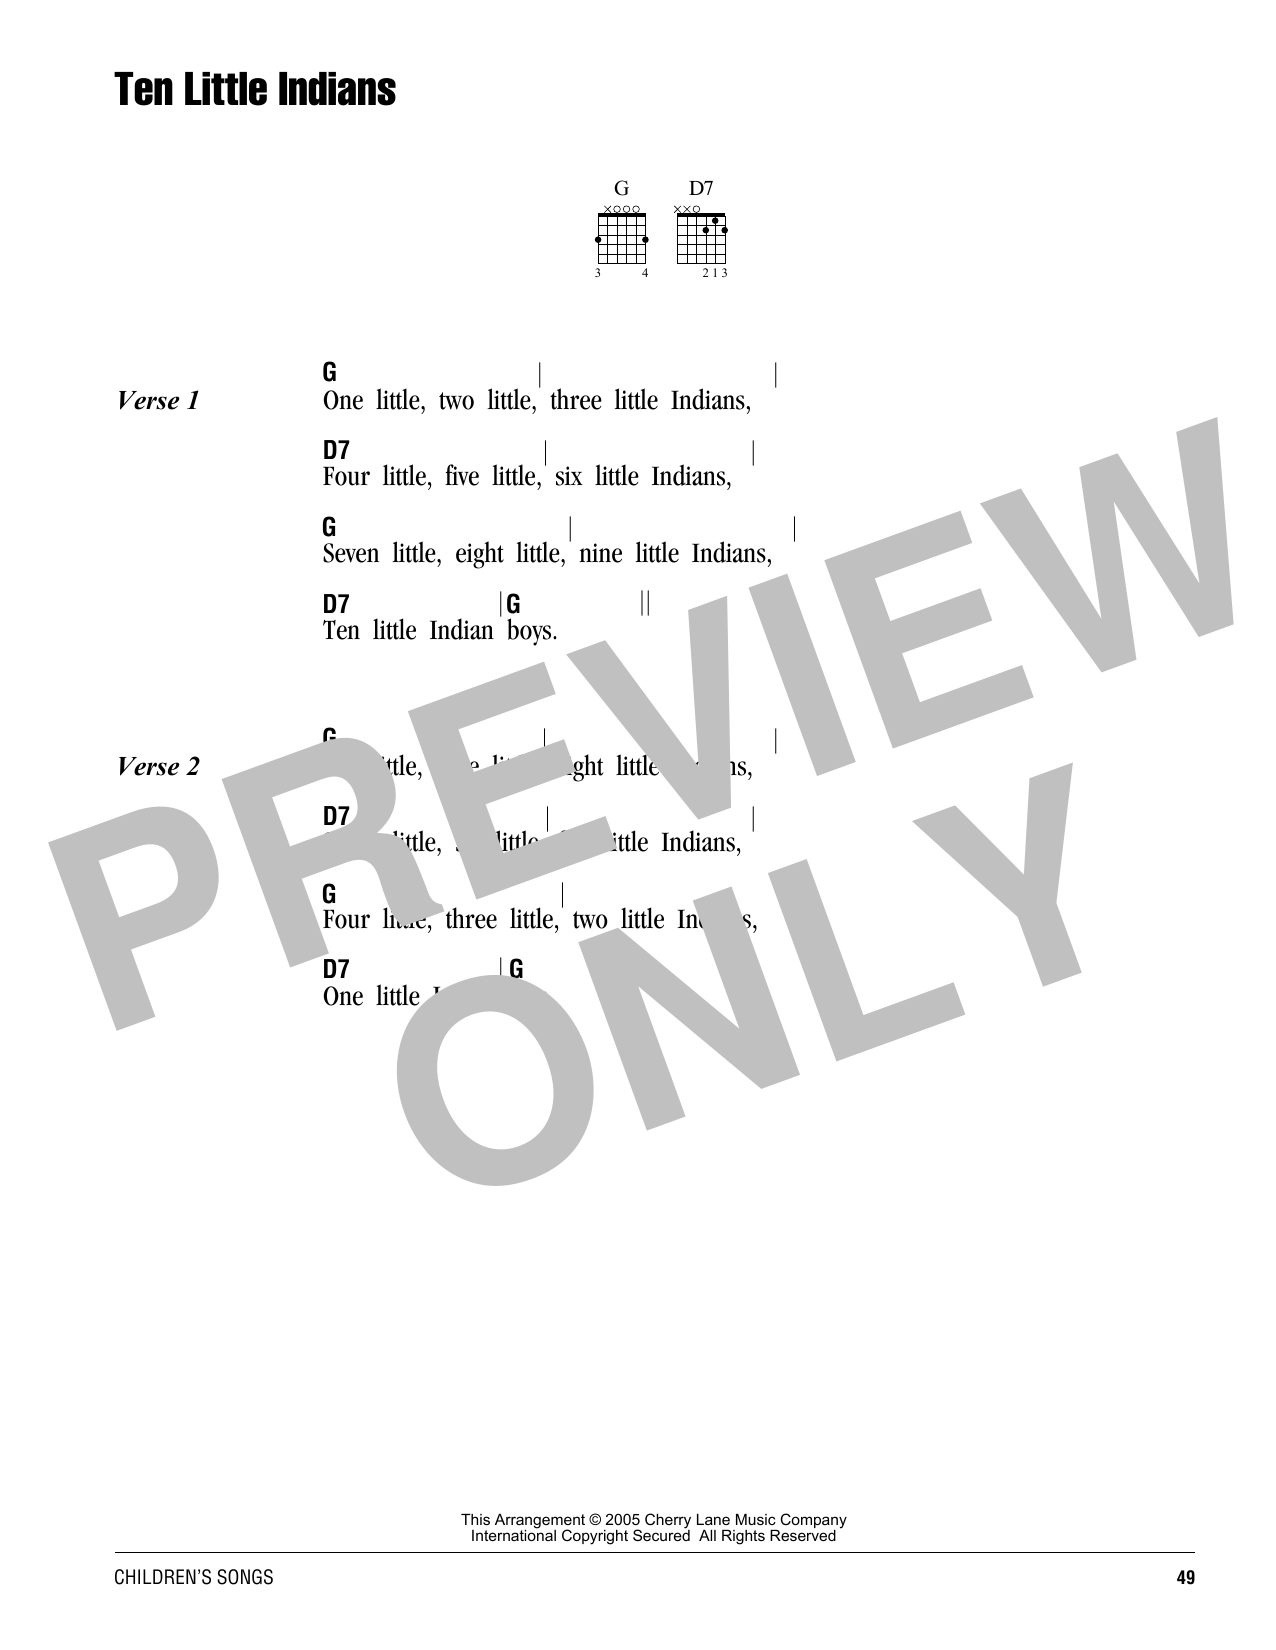 Ten Little Indians sheet music by Traditional (Lyrics